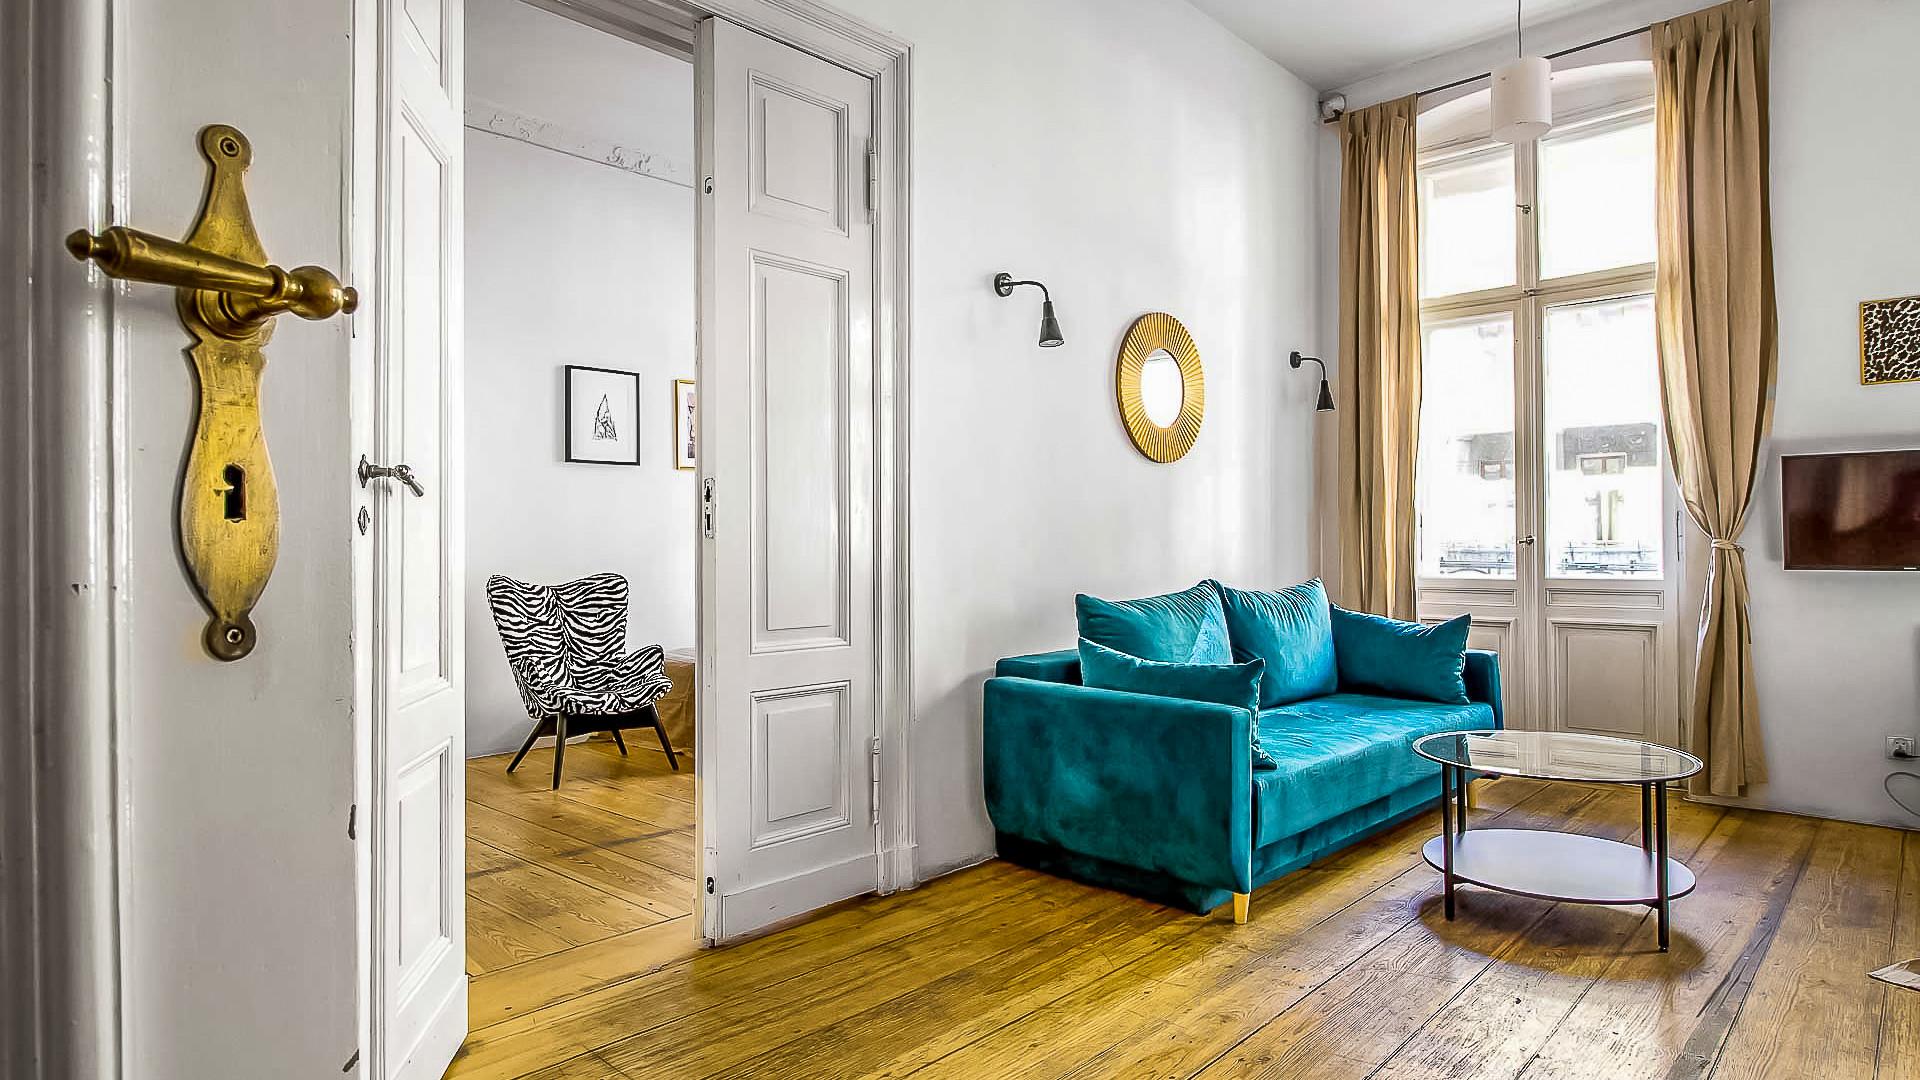 Apartment 6 7 8 osob Poznan Old Town (12